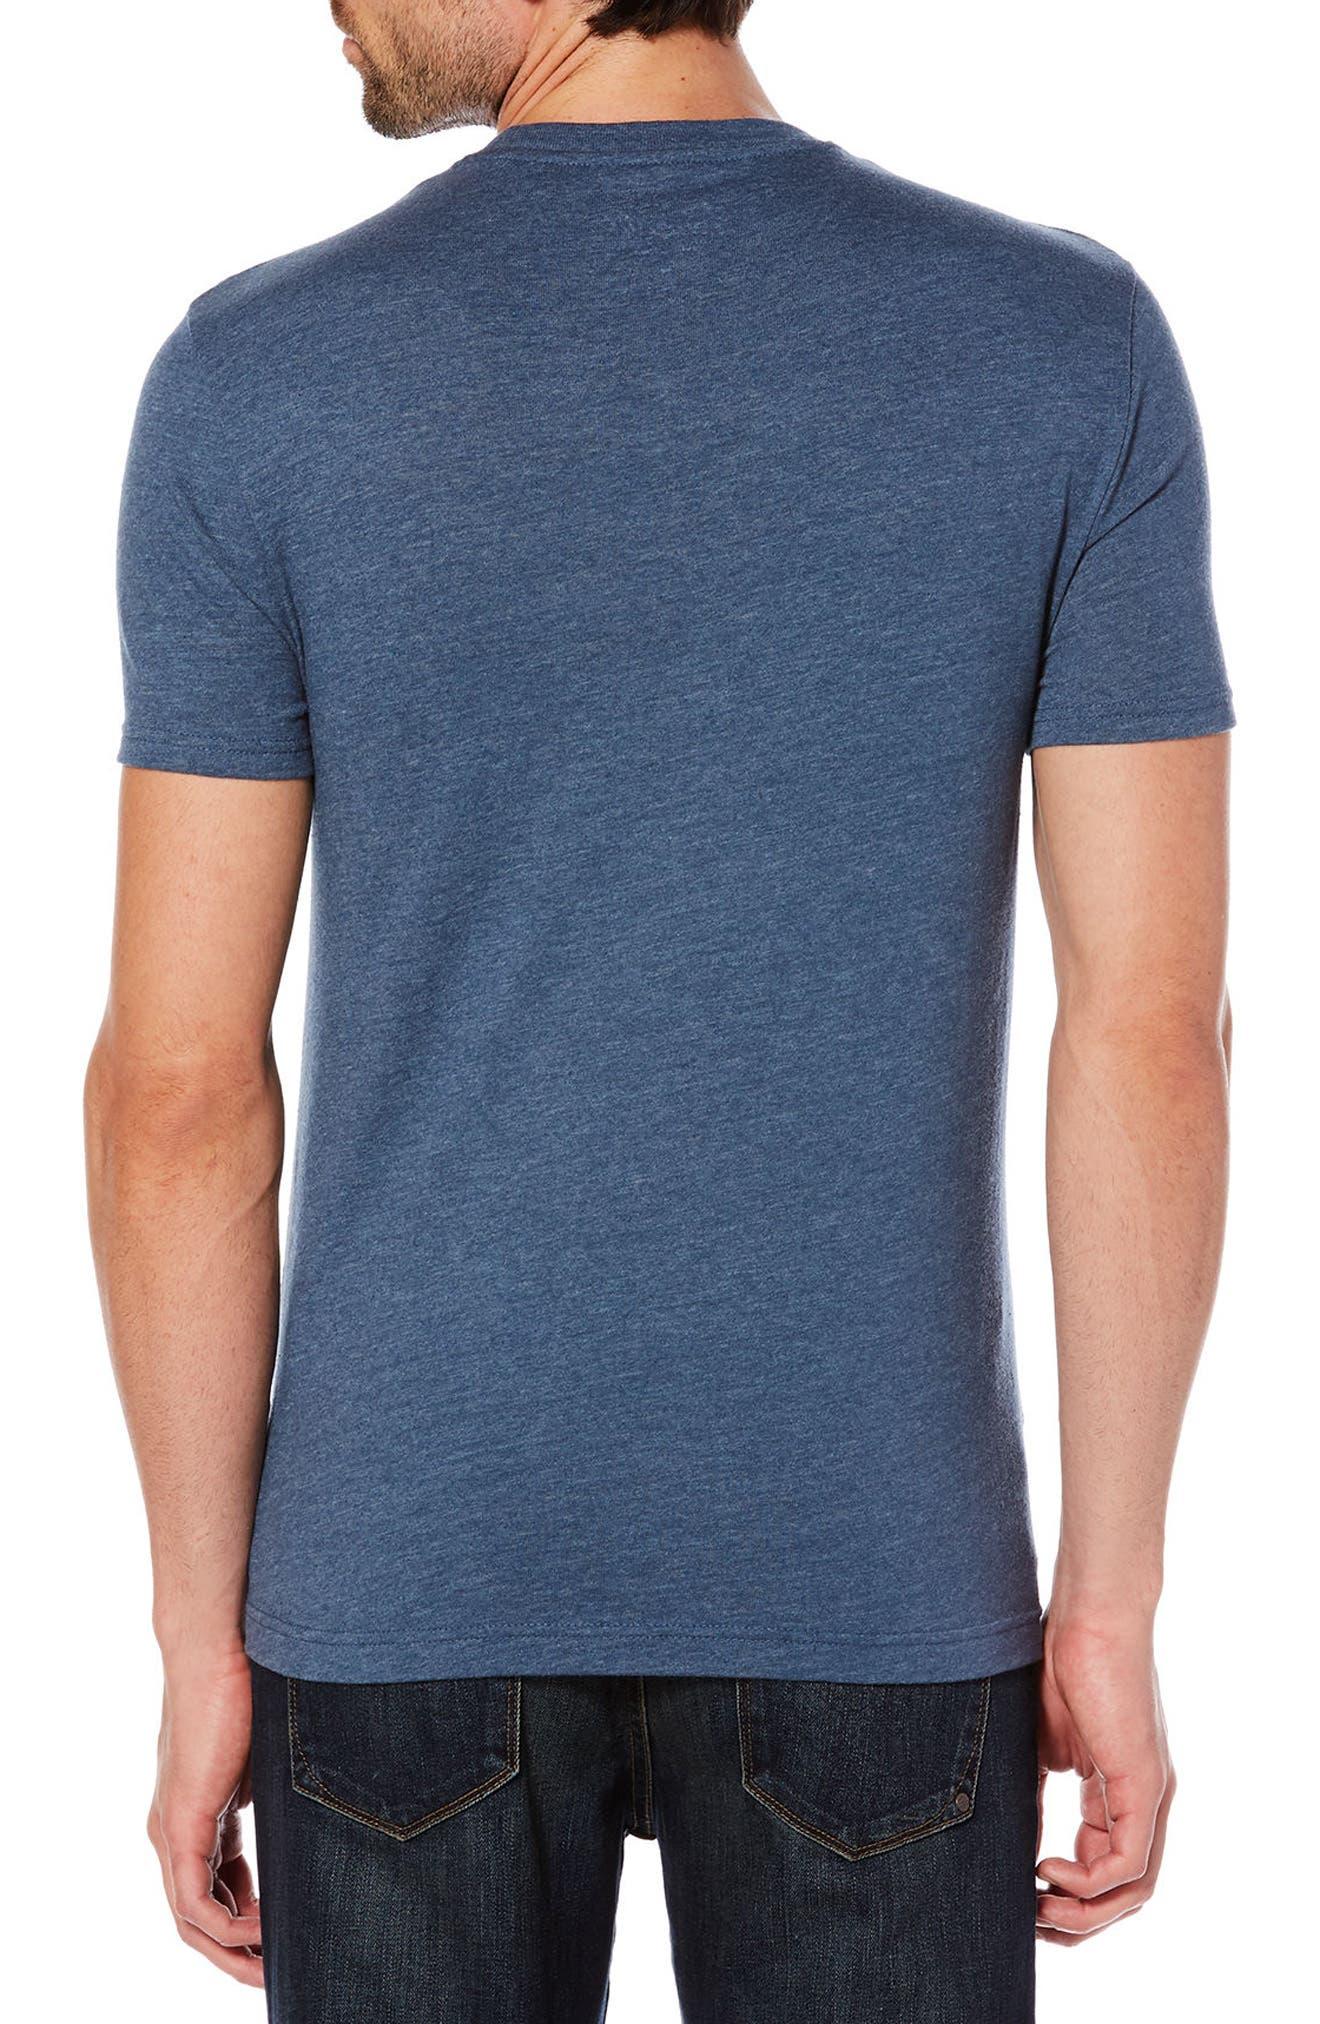 Moving Shapes Pete T-Shirt,                             Alternate thumbnail 2, color,                             Vintage Indigo